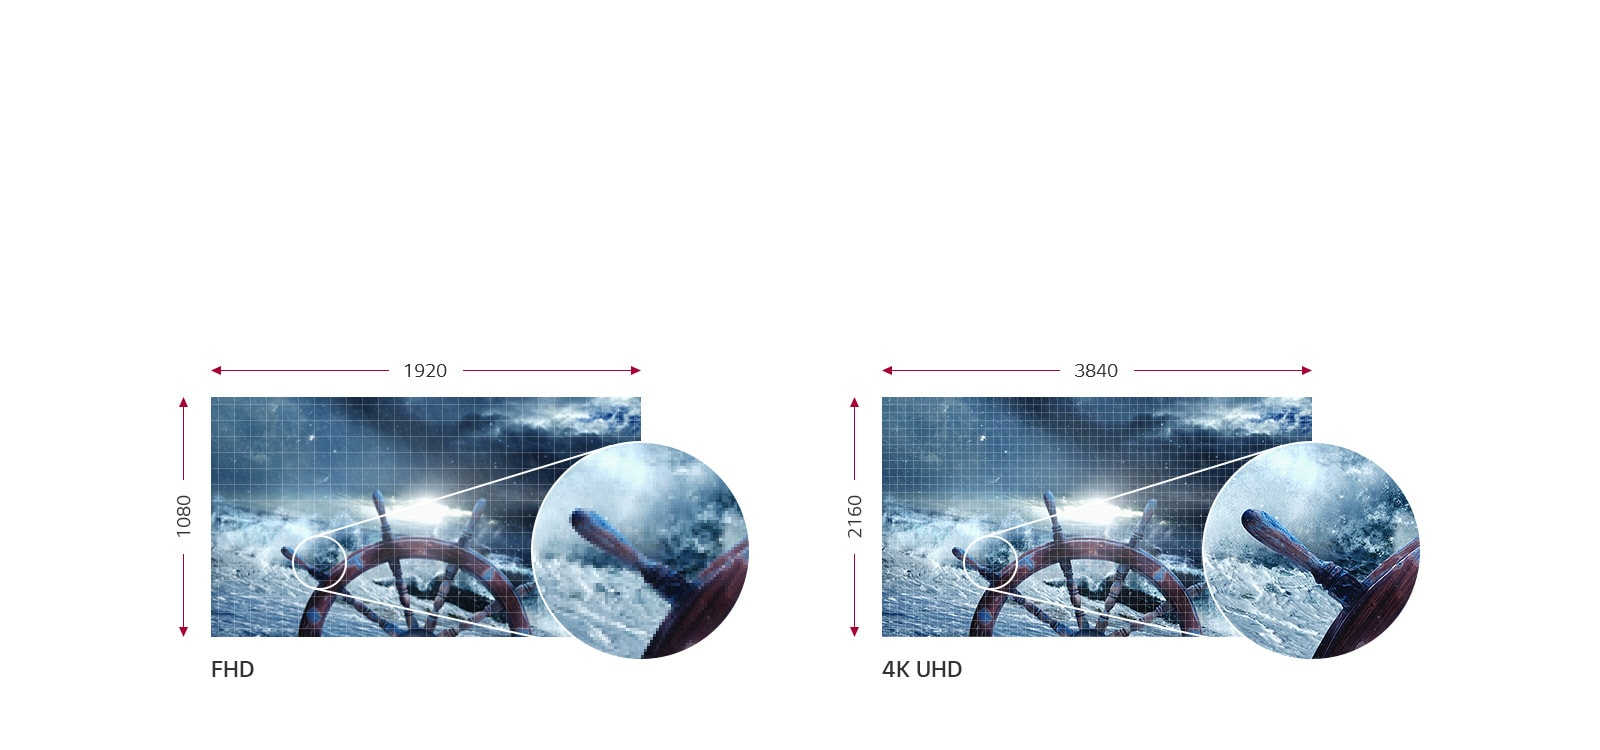 LG 4K UHD with 8.3 Megapixels